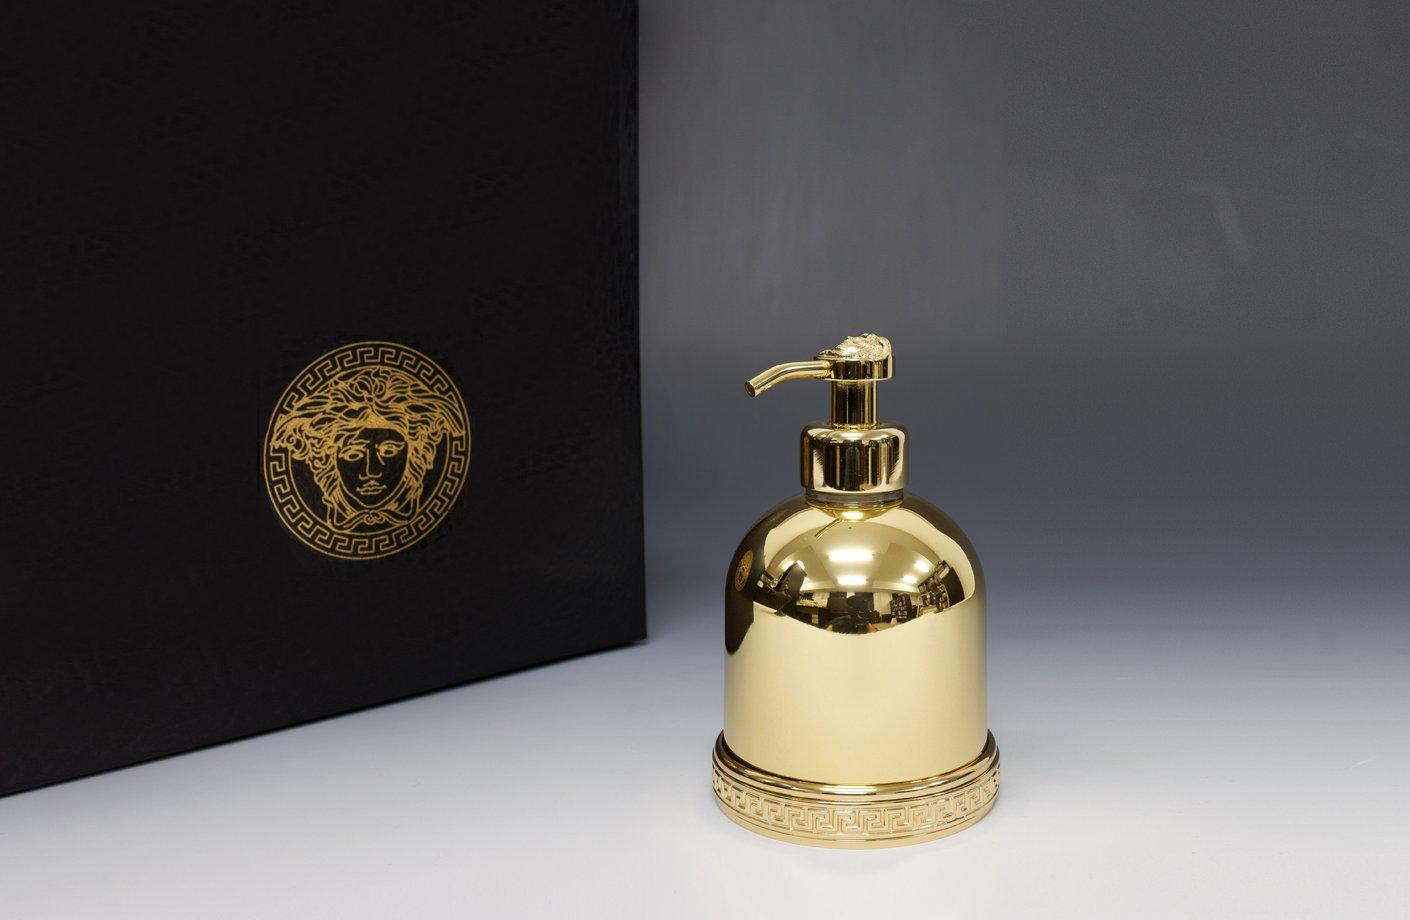 Medusa soap dispenser versace home australia for Versace bathroom accessories